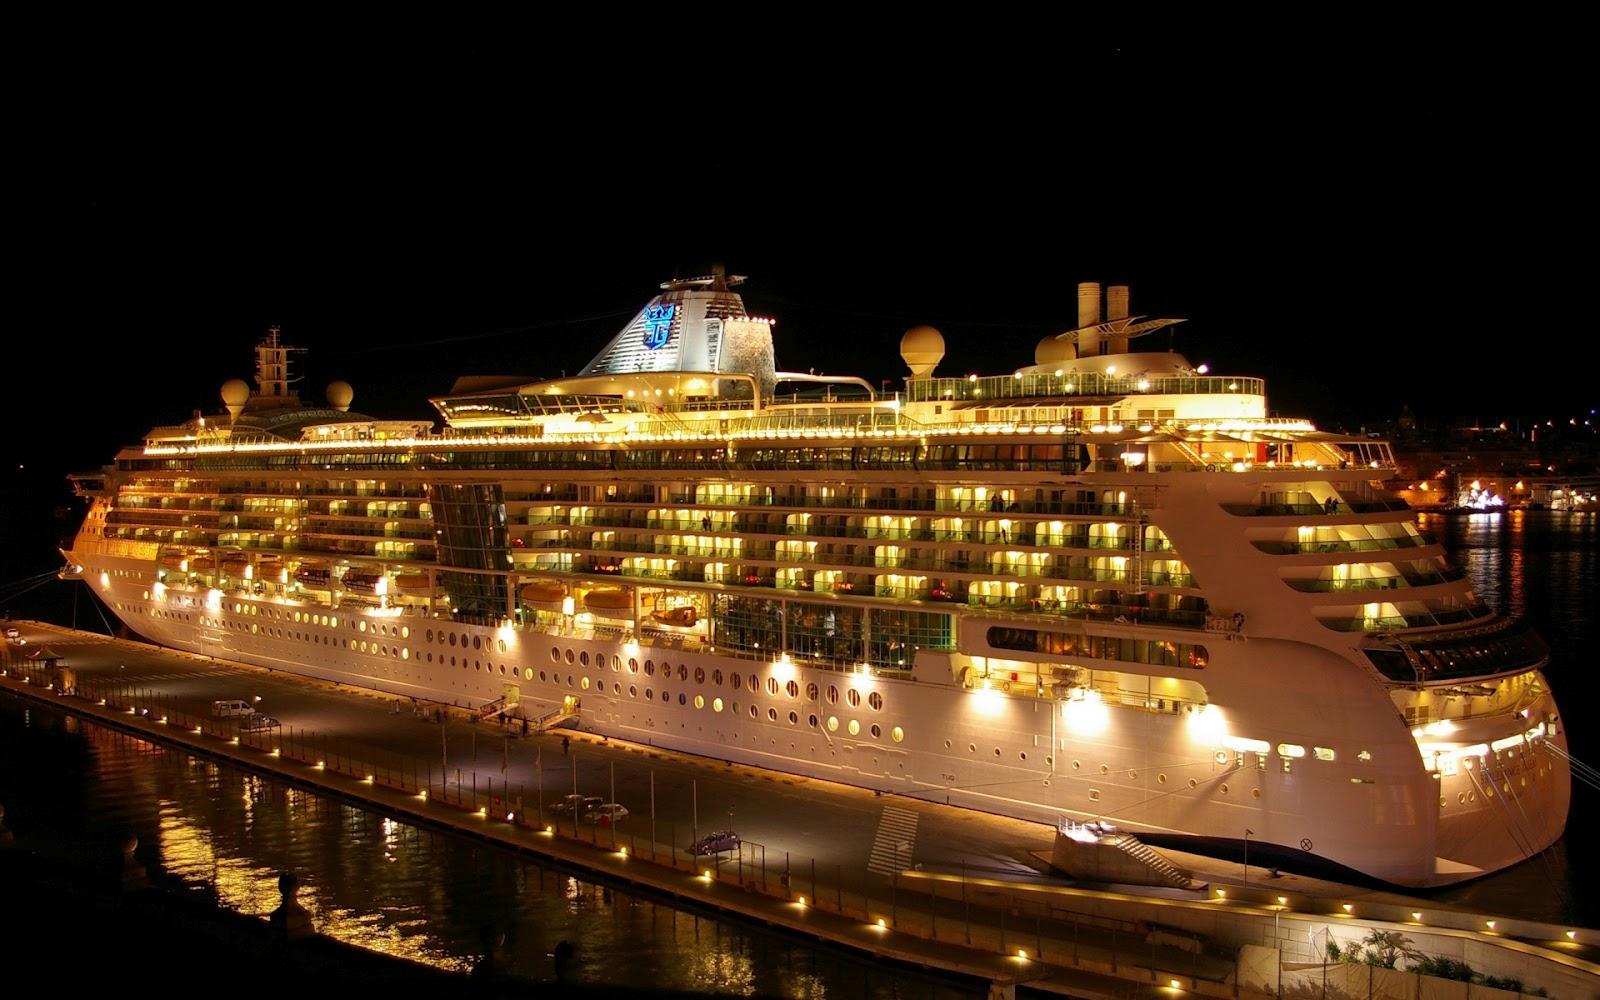 http://3.bp.blogspot.com/-UP-nhr6aDtc/T24rhOWexeI/AAAAAAAAAKU/jPaSSOFOUf0/s1600/cruise+ship11.jpg